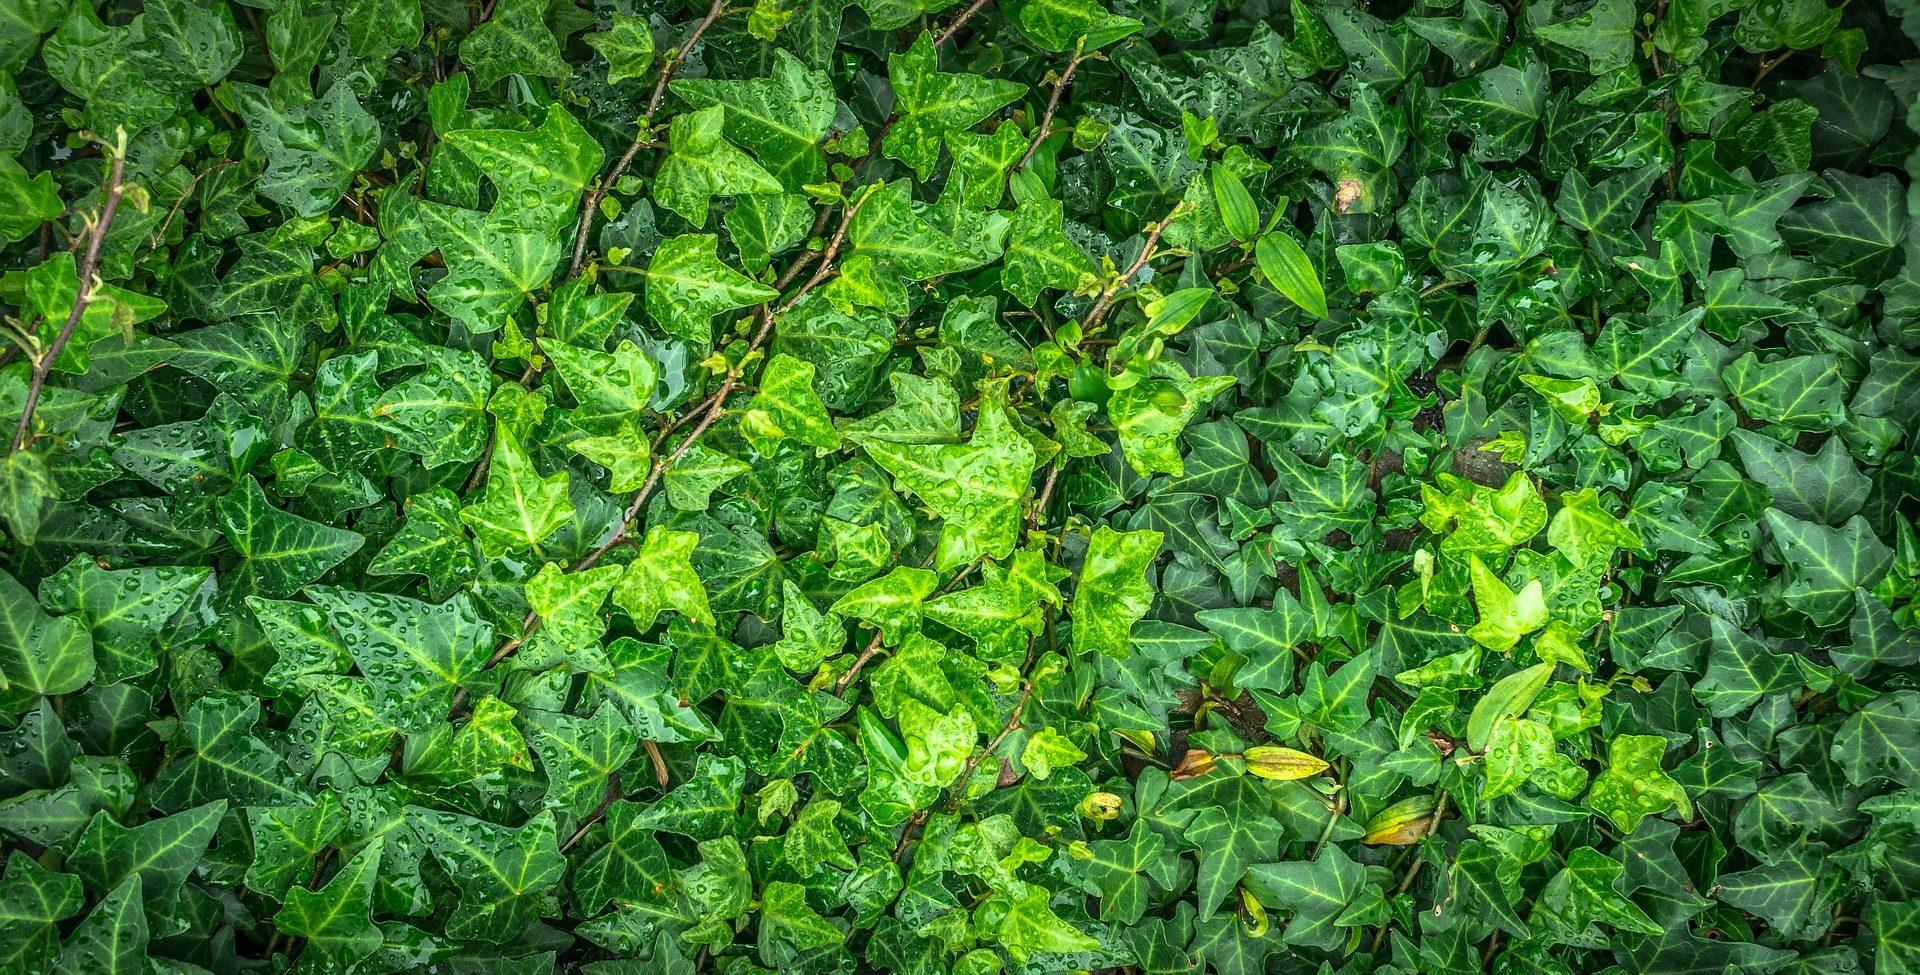 folhas, plantas, vegetación, Rastejante, Verde - Papéis de parede HD - Professor-falken.com